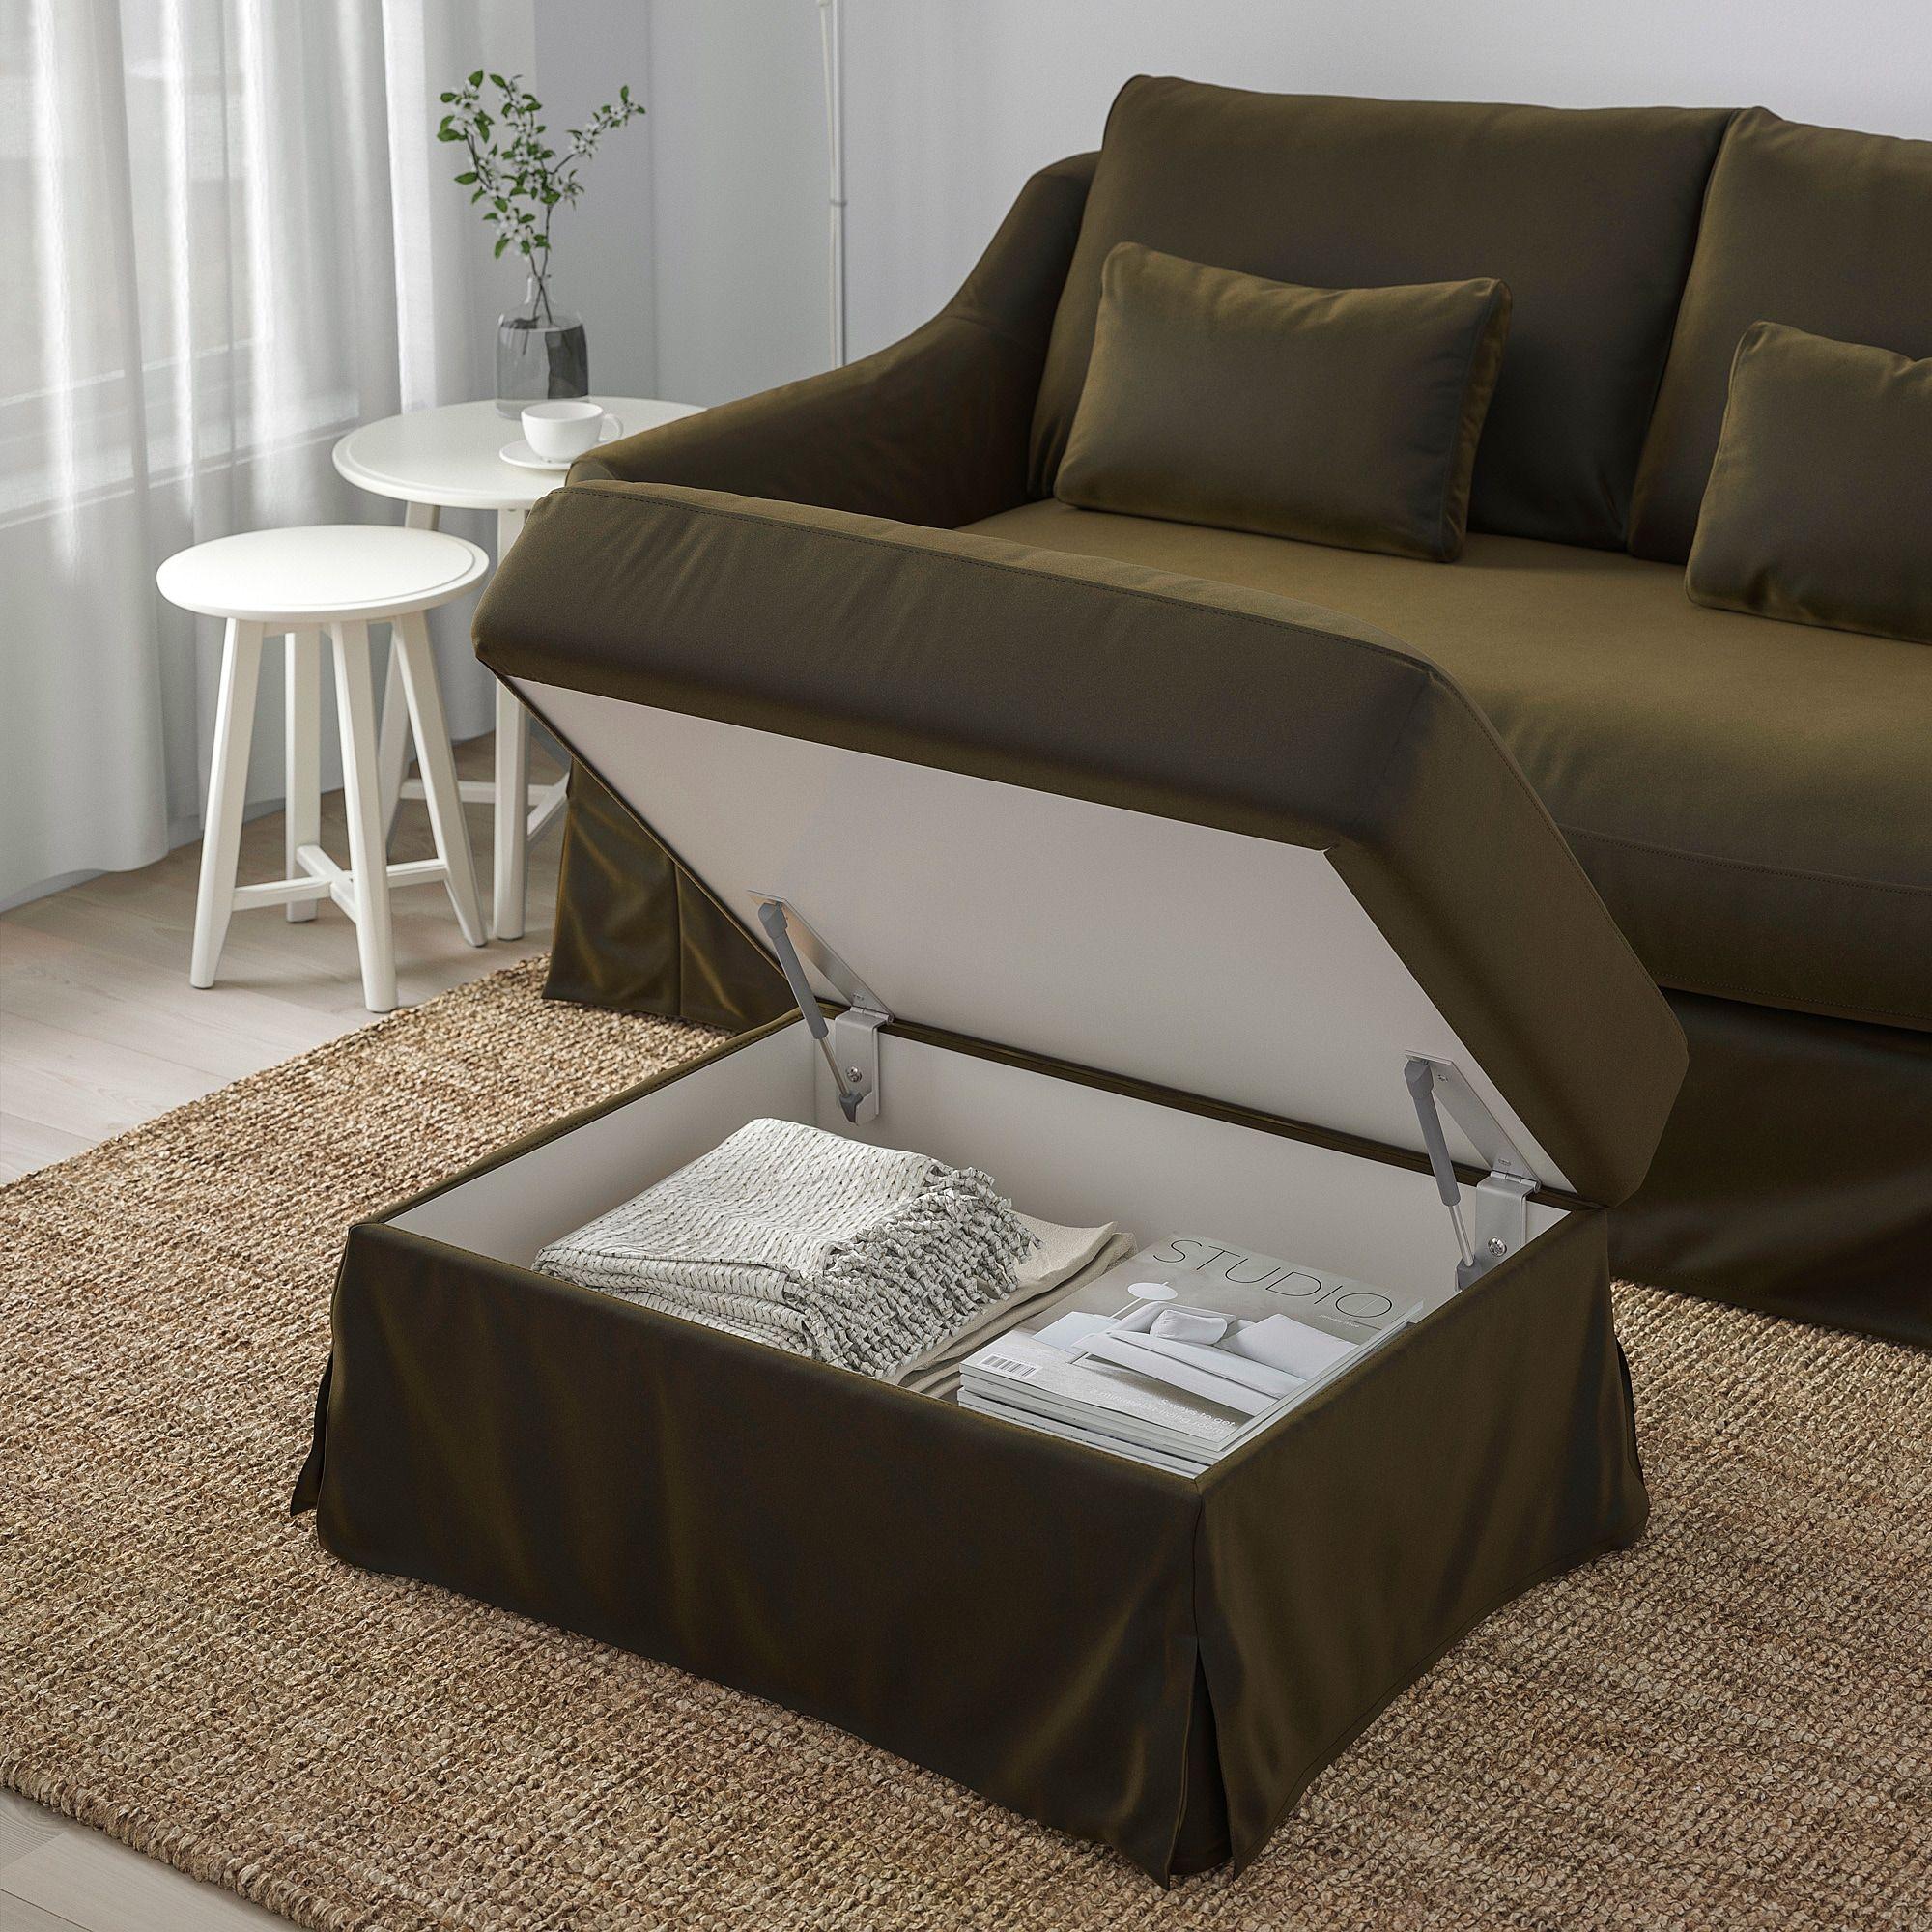 Farlov Ottoman With Storage Djuparp Dark Olive Green Ikea In 2021 Storage Ottoman Storage Footstool Ikea [ 2000 x 2000 Pixel ]